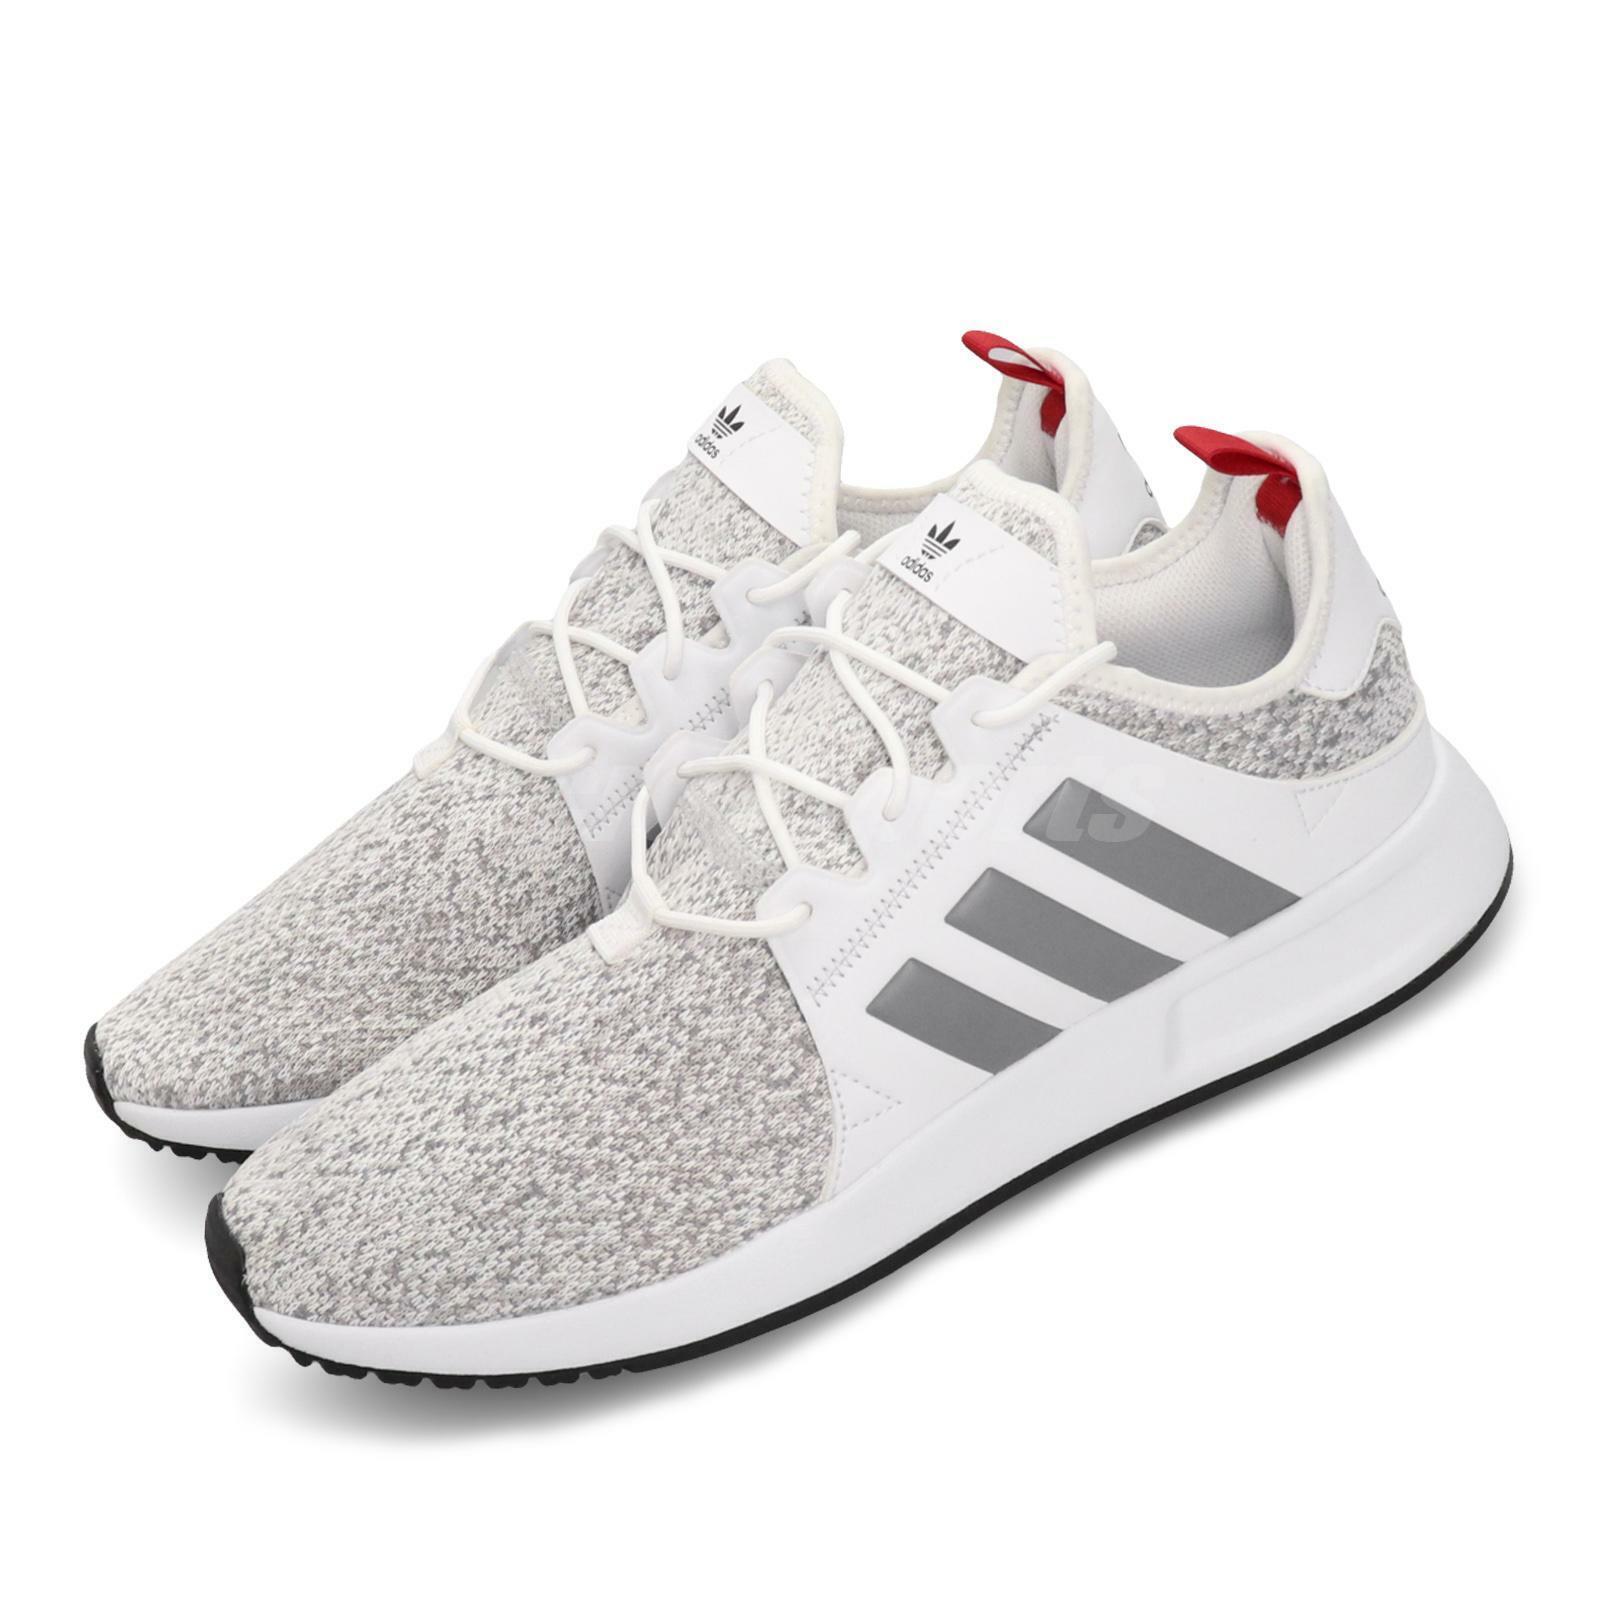 Adidas Originals X fu PLR wit kudde SAutolet mannen hardlopen schoenen sportschoenen F33899